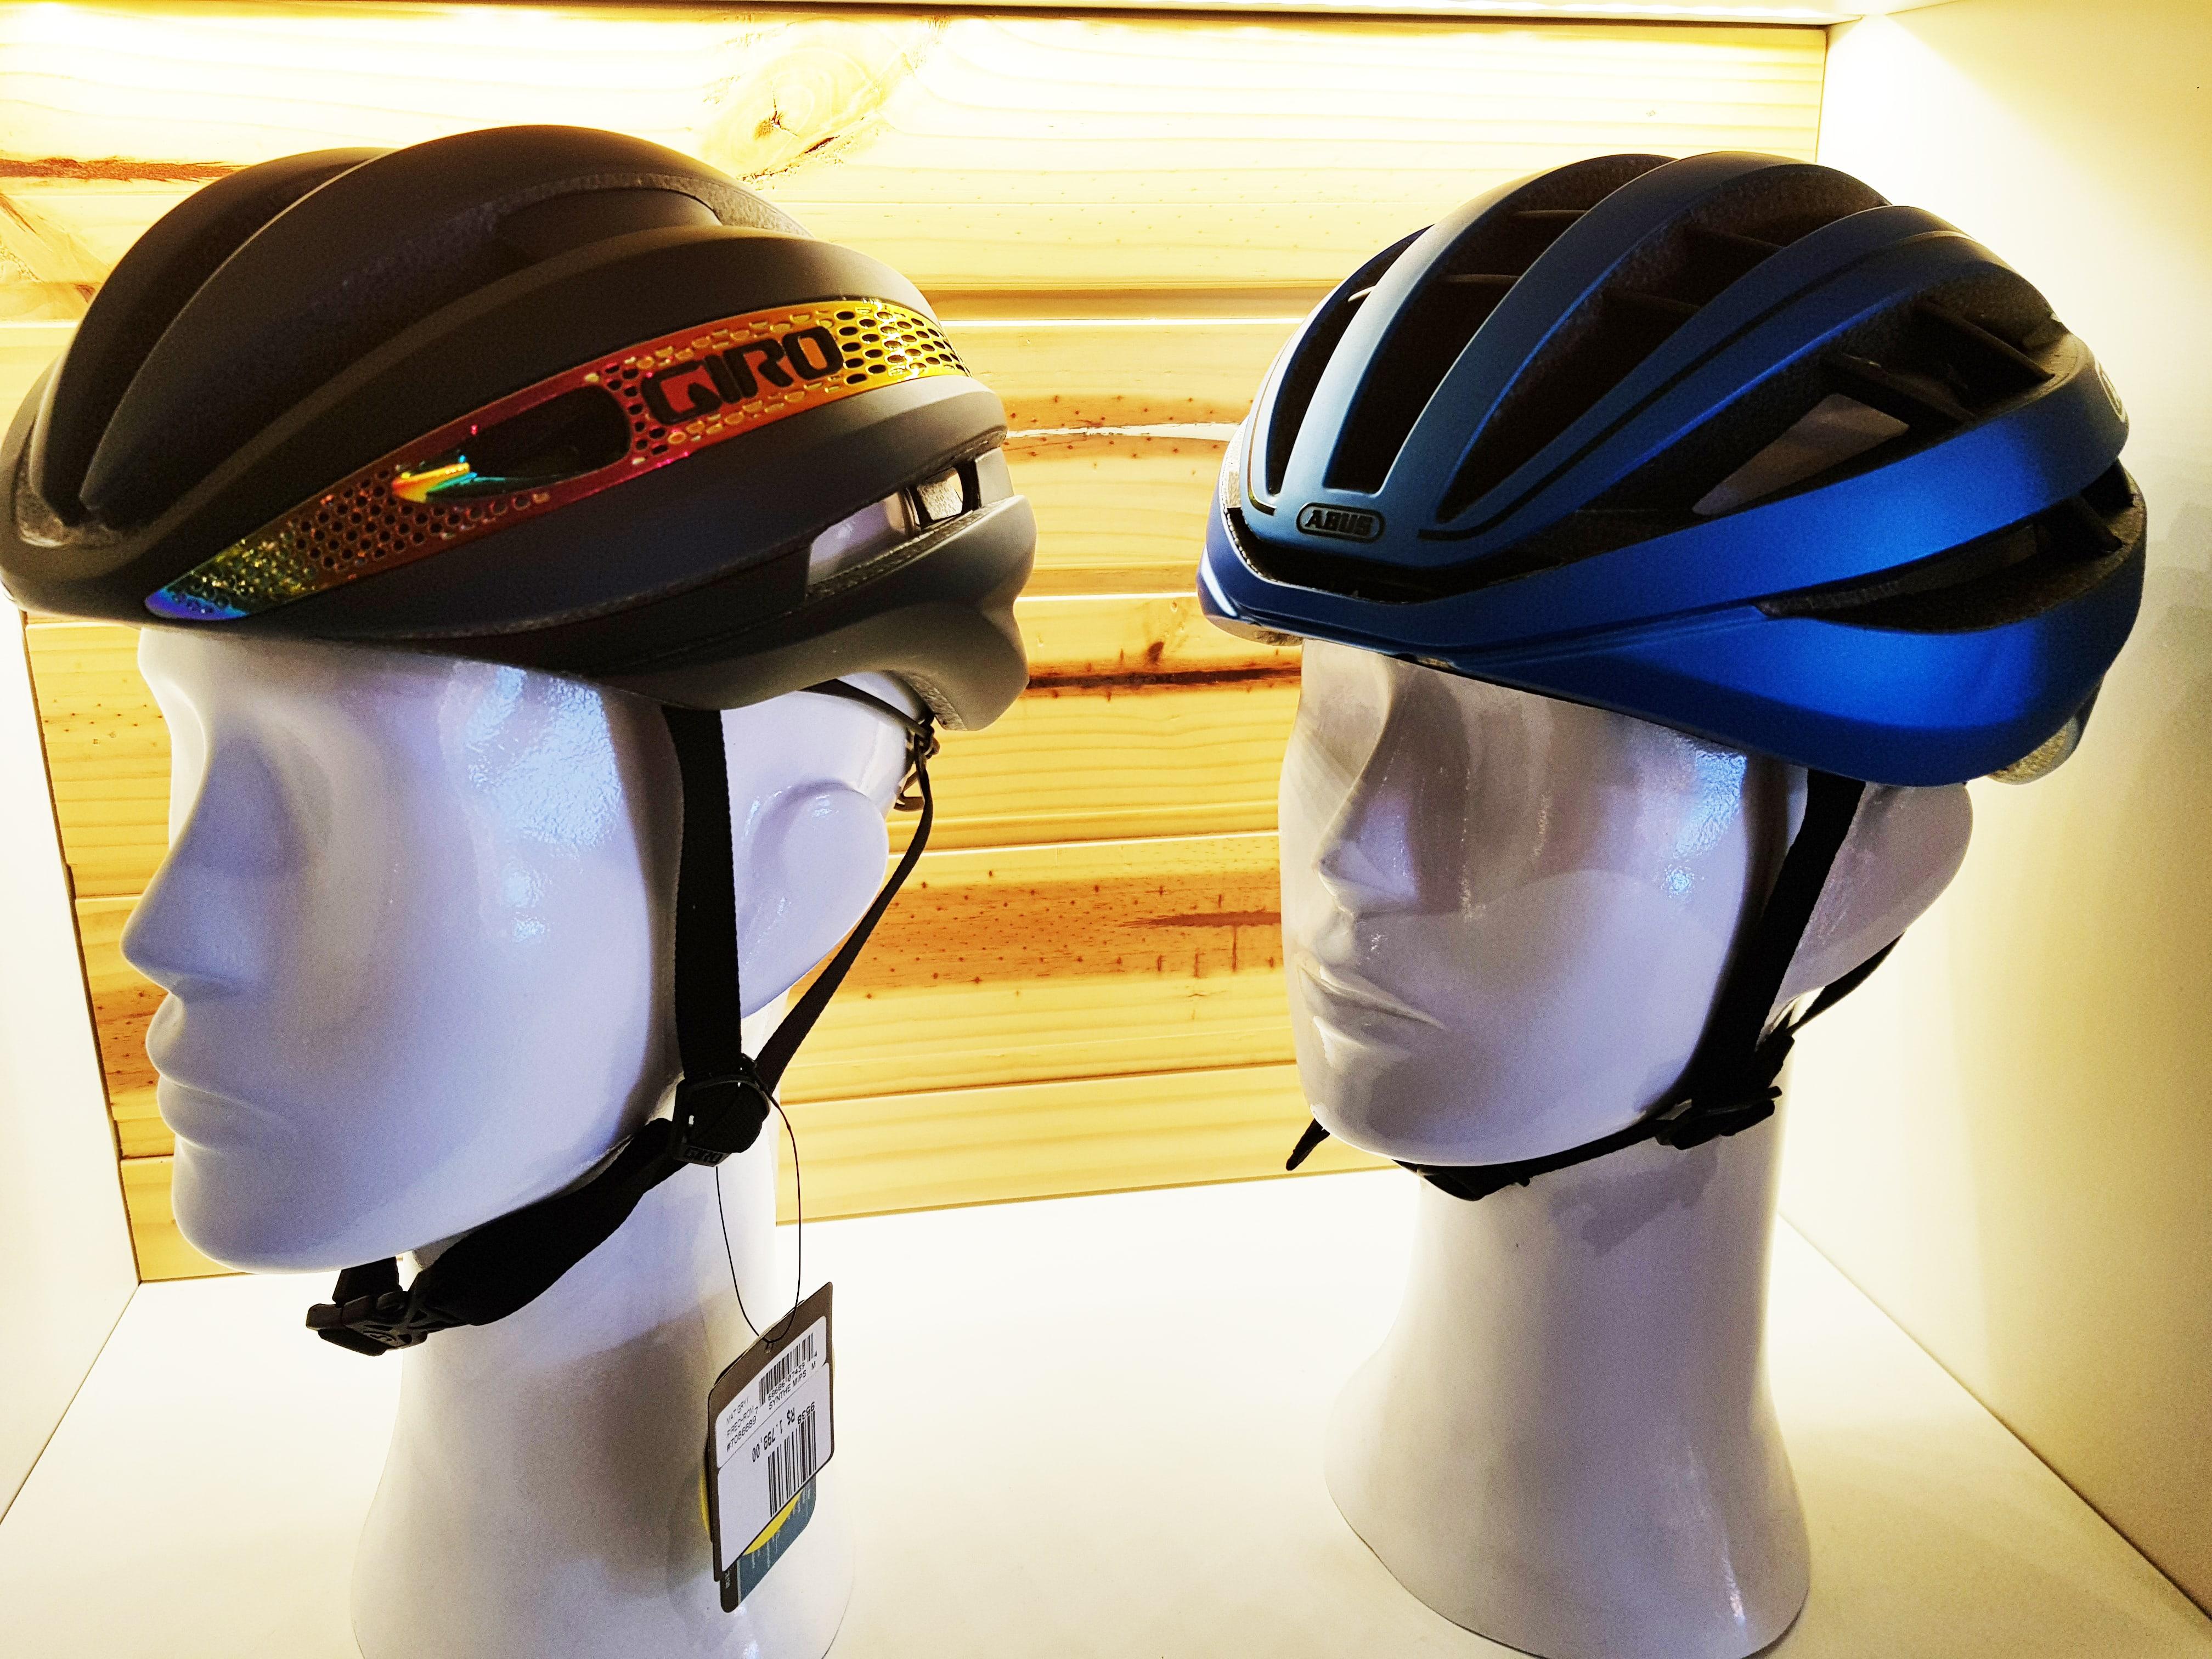 Capacetes expostos na loja da Bicicletaria Faria Lima